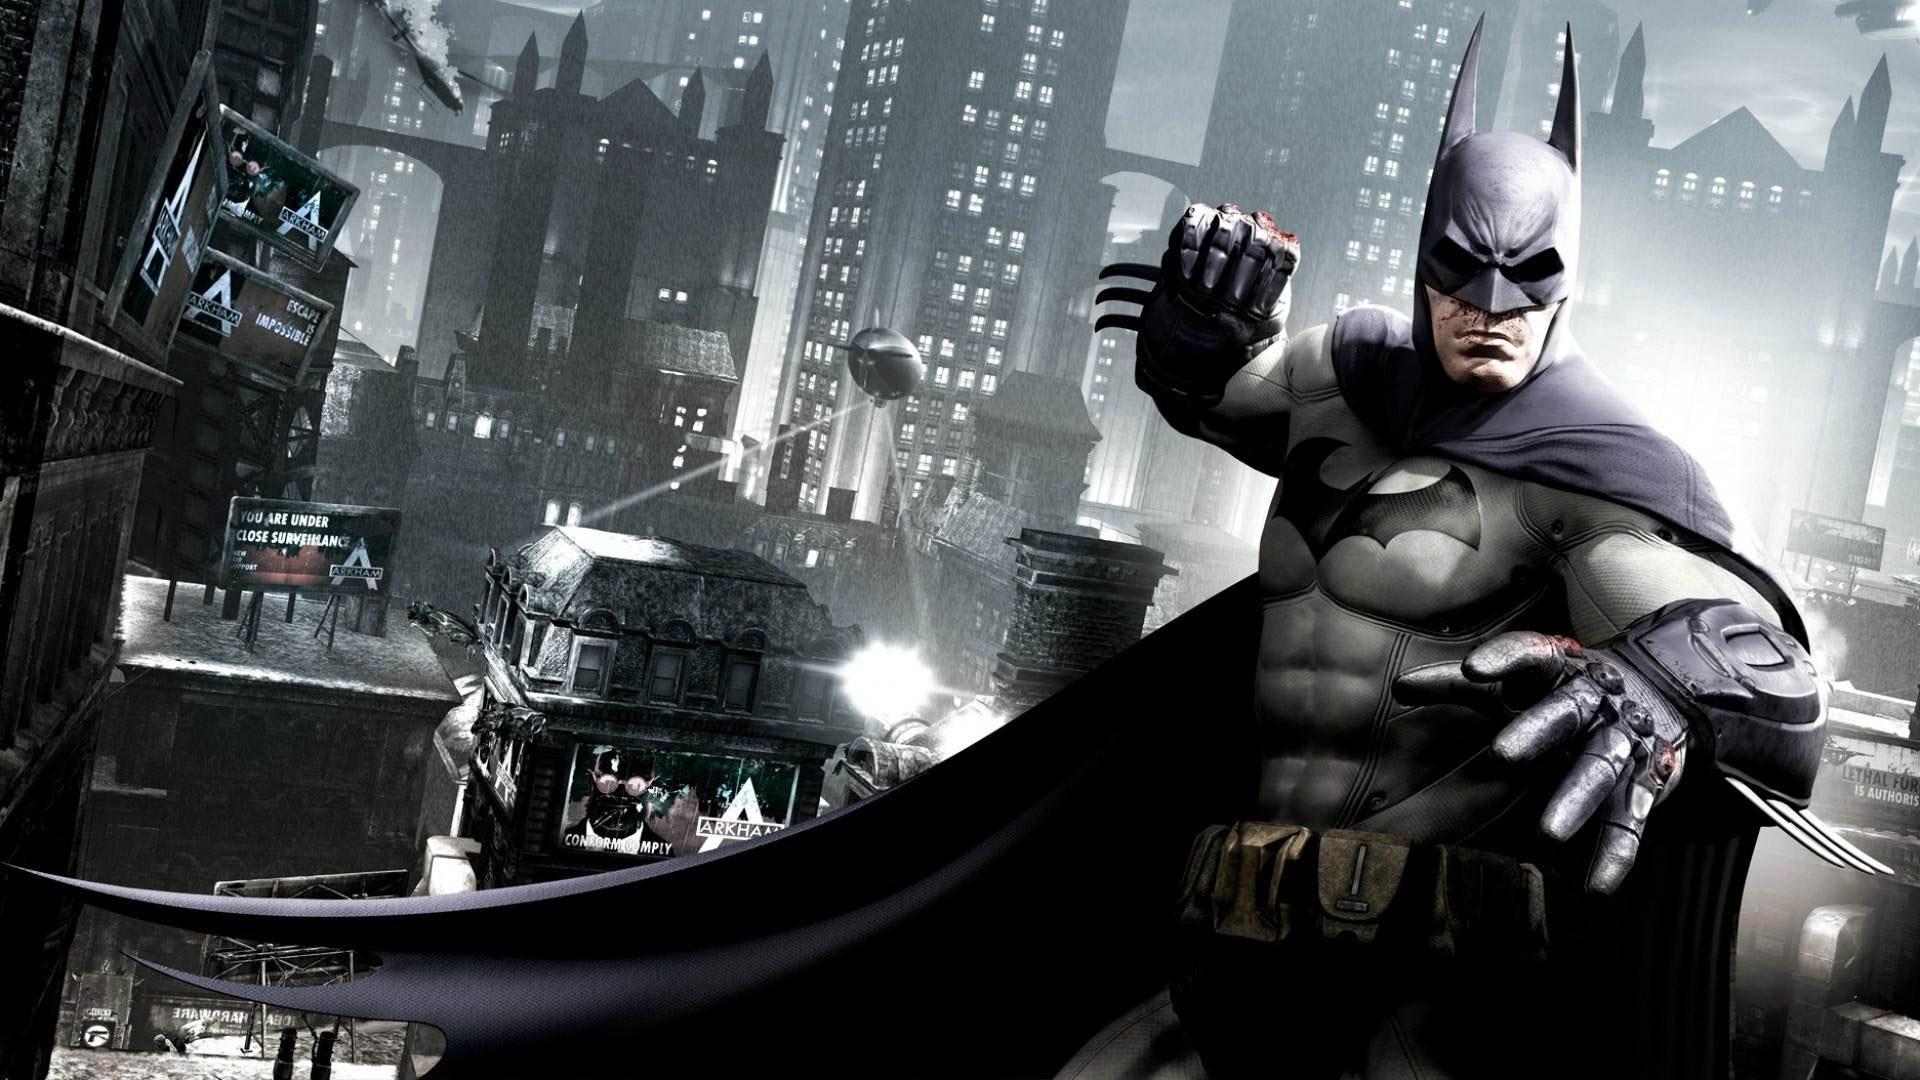 Batman Arkham Origins Wallpapers in HD Page 1 1920x1080